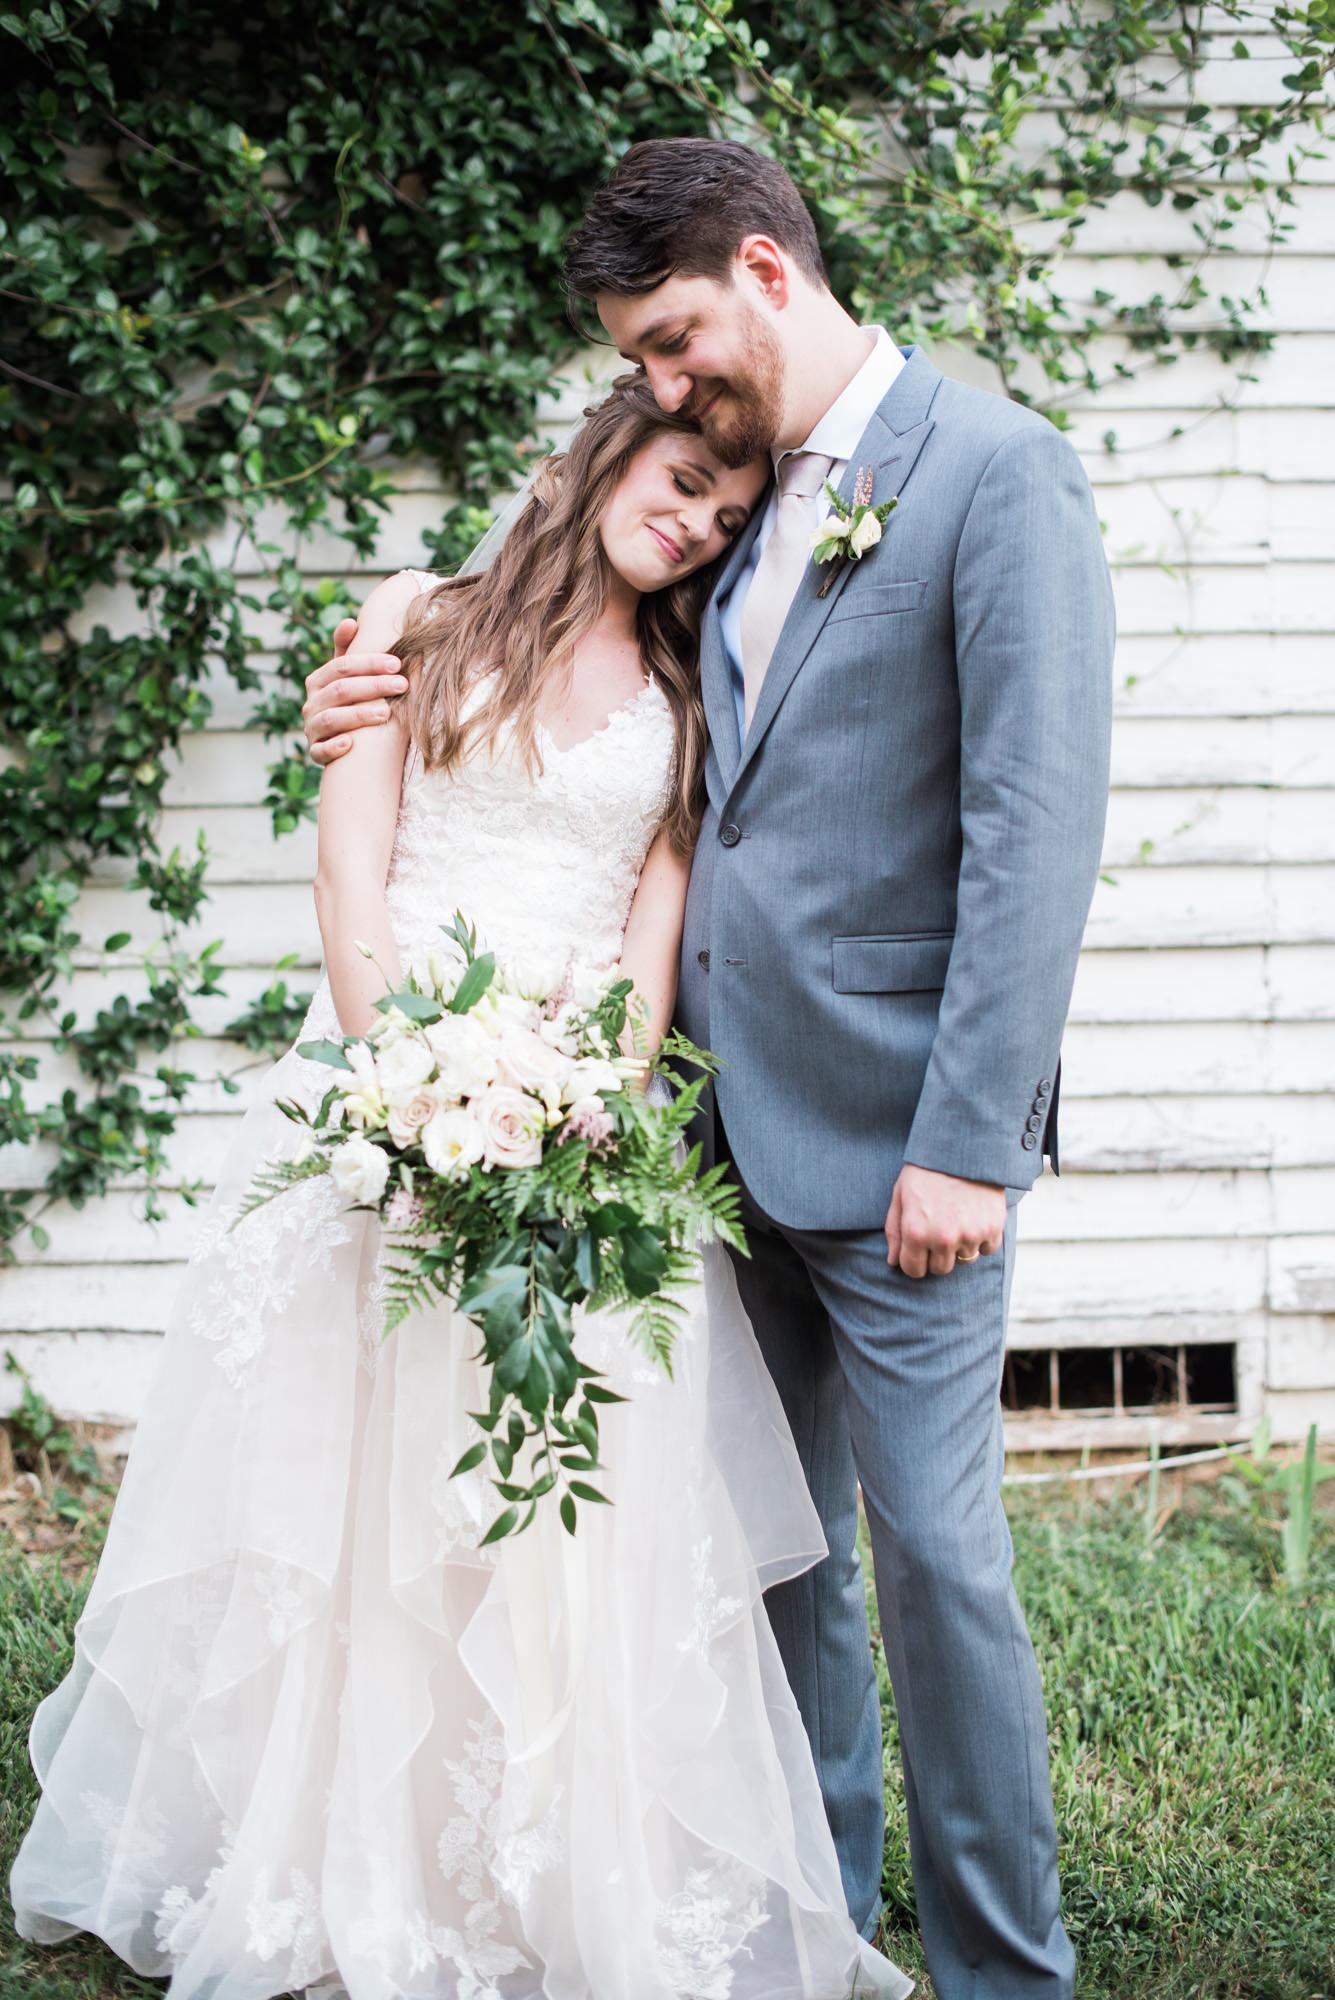 Athens-Georgia-wedding-photographer-59.jpg